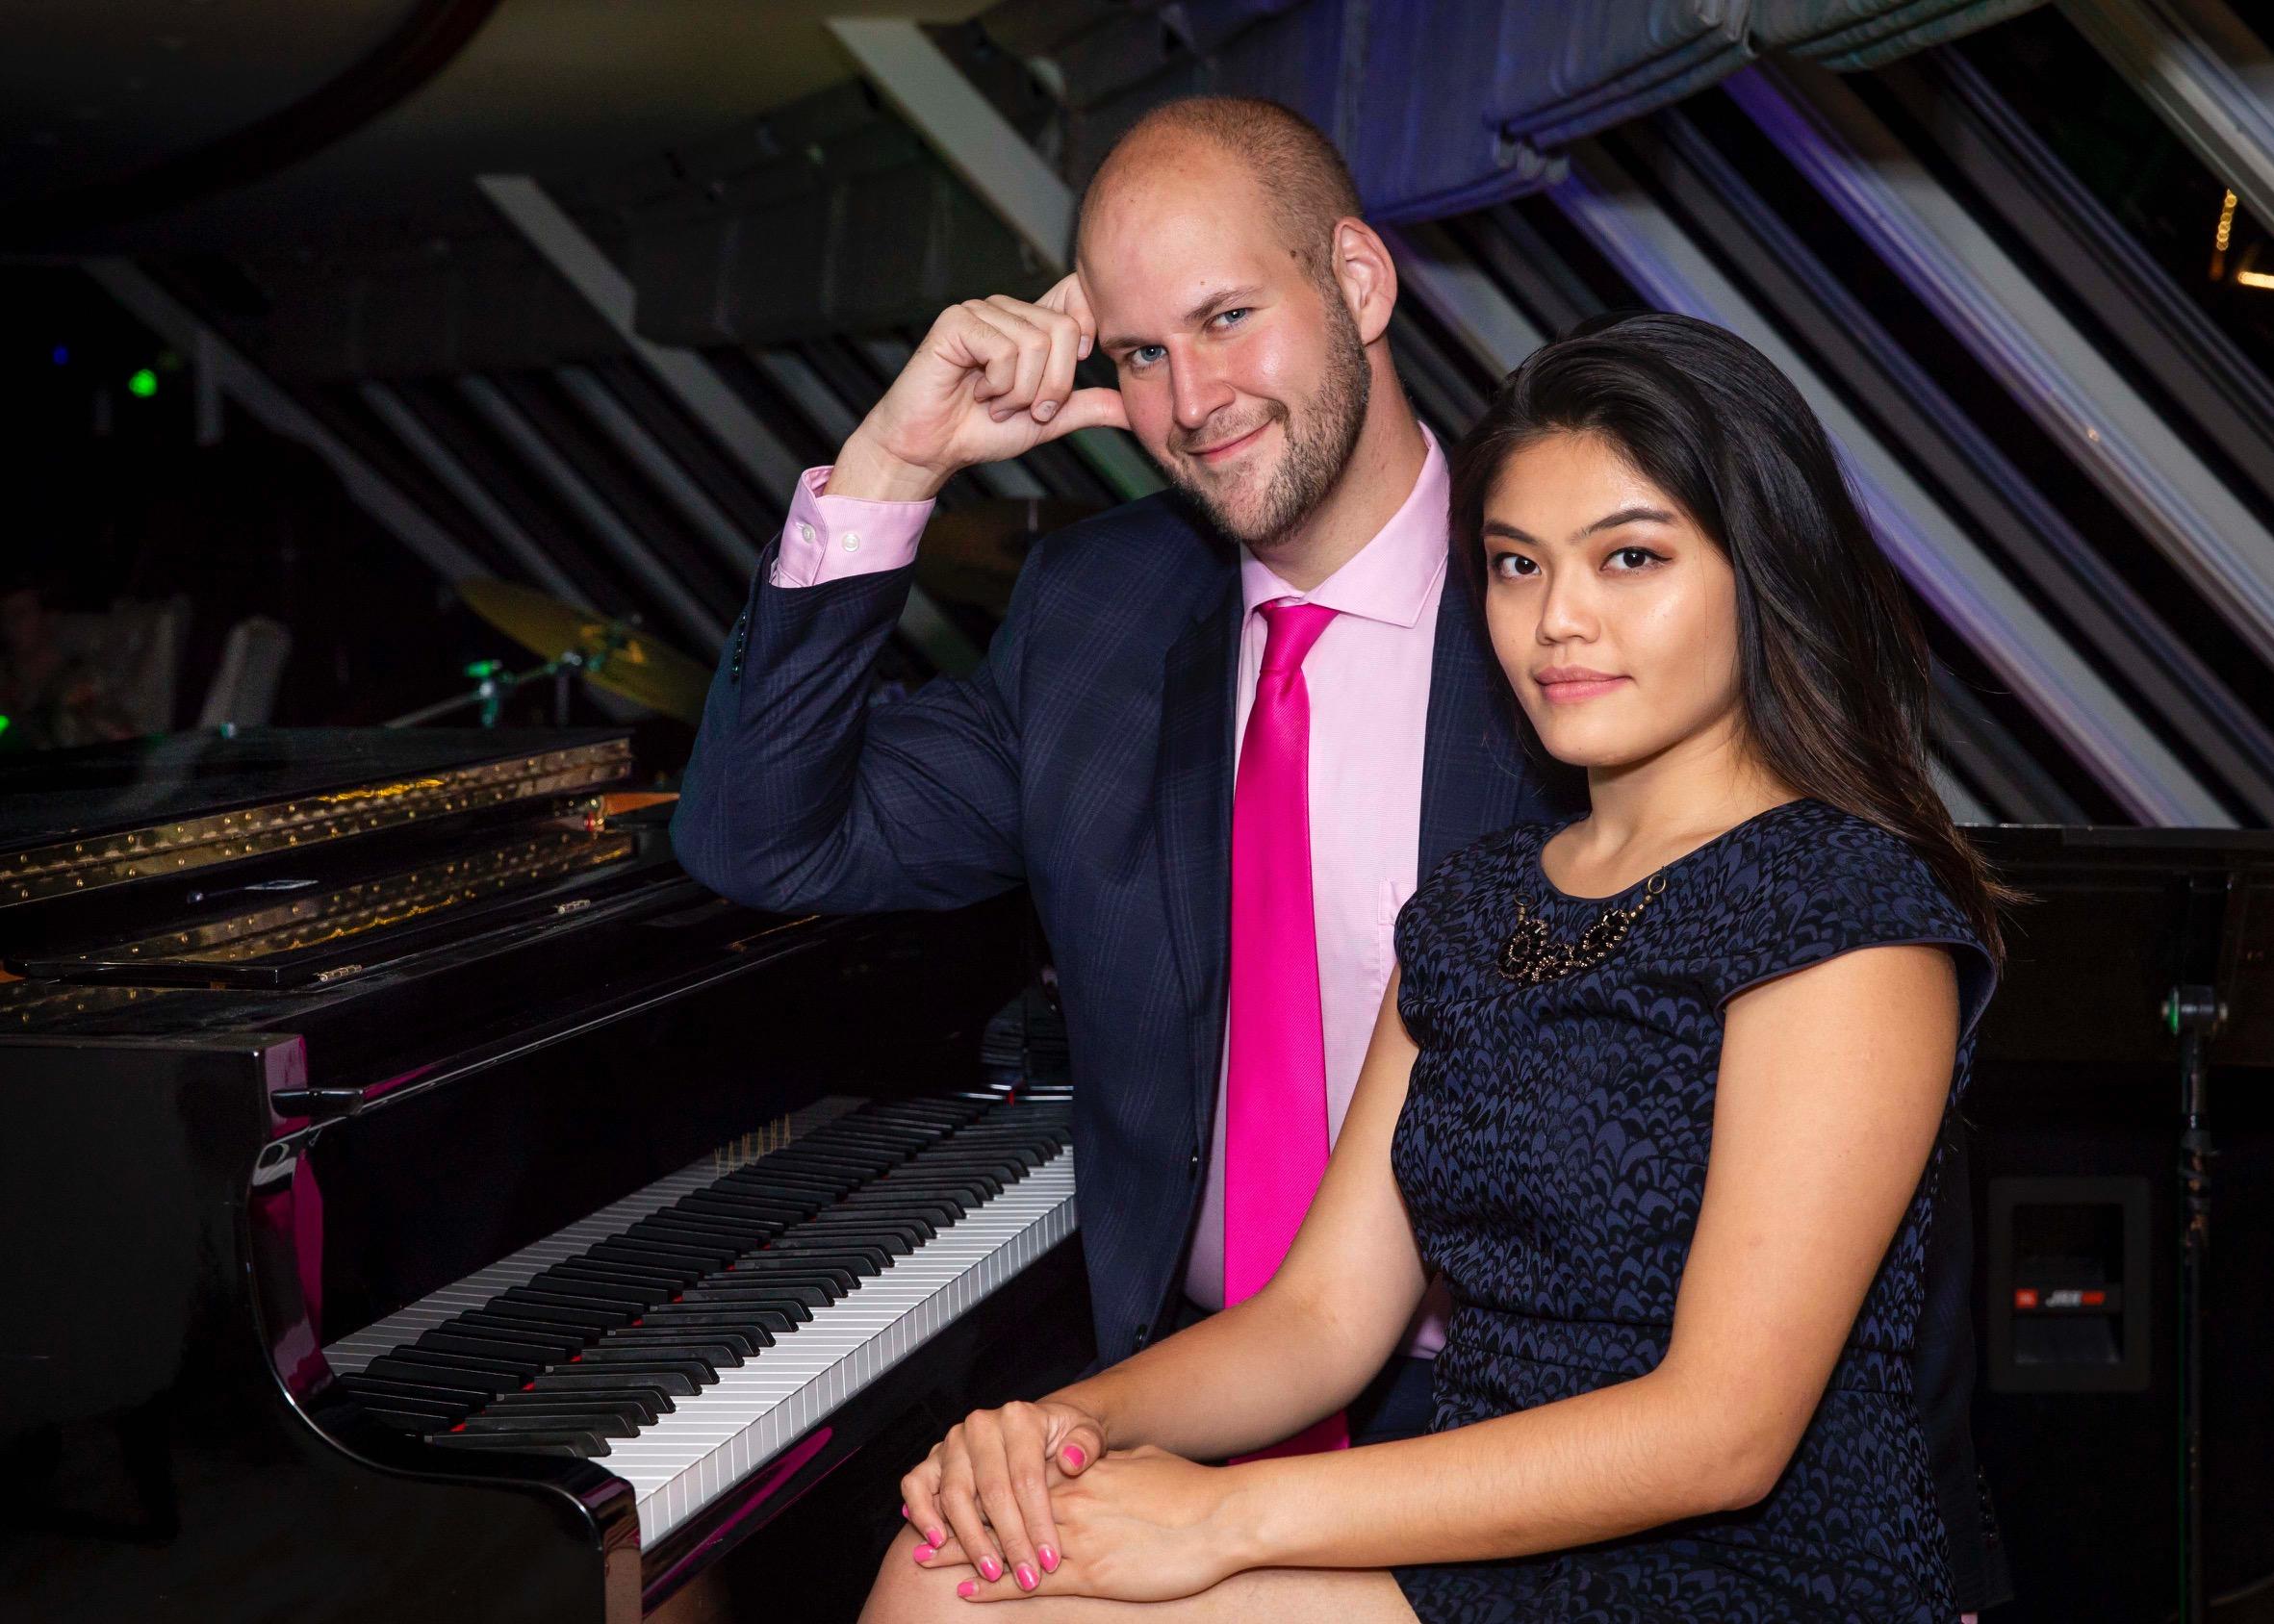 Ben venga amore: Welcome, Love!  Azamara Quest (with pianist Monica Lü)